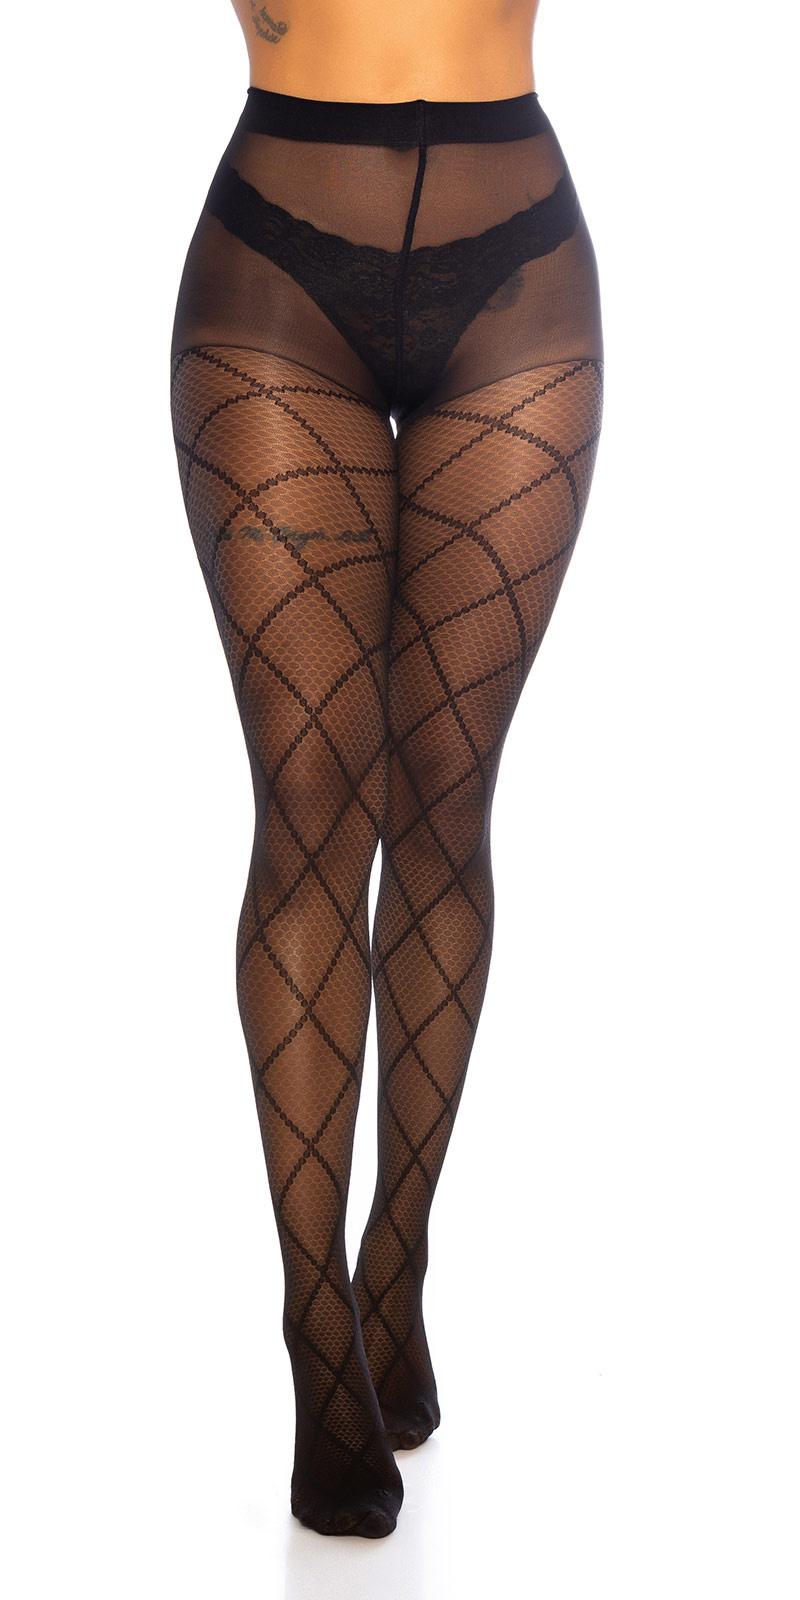 Trendy panty met diamond patroon zwart